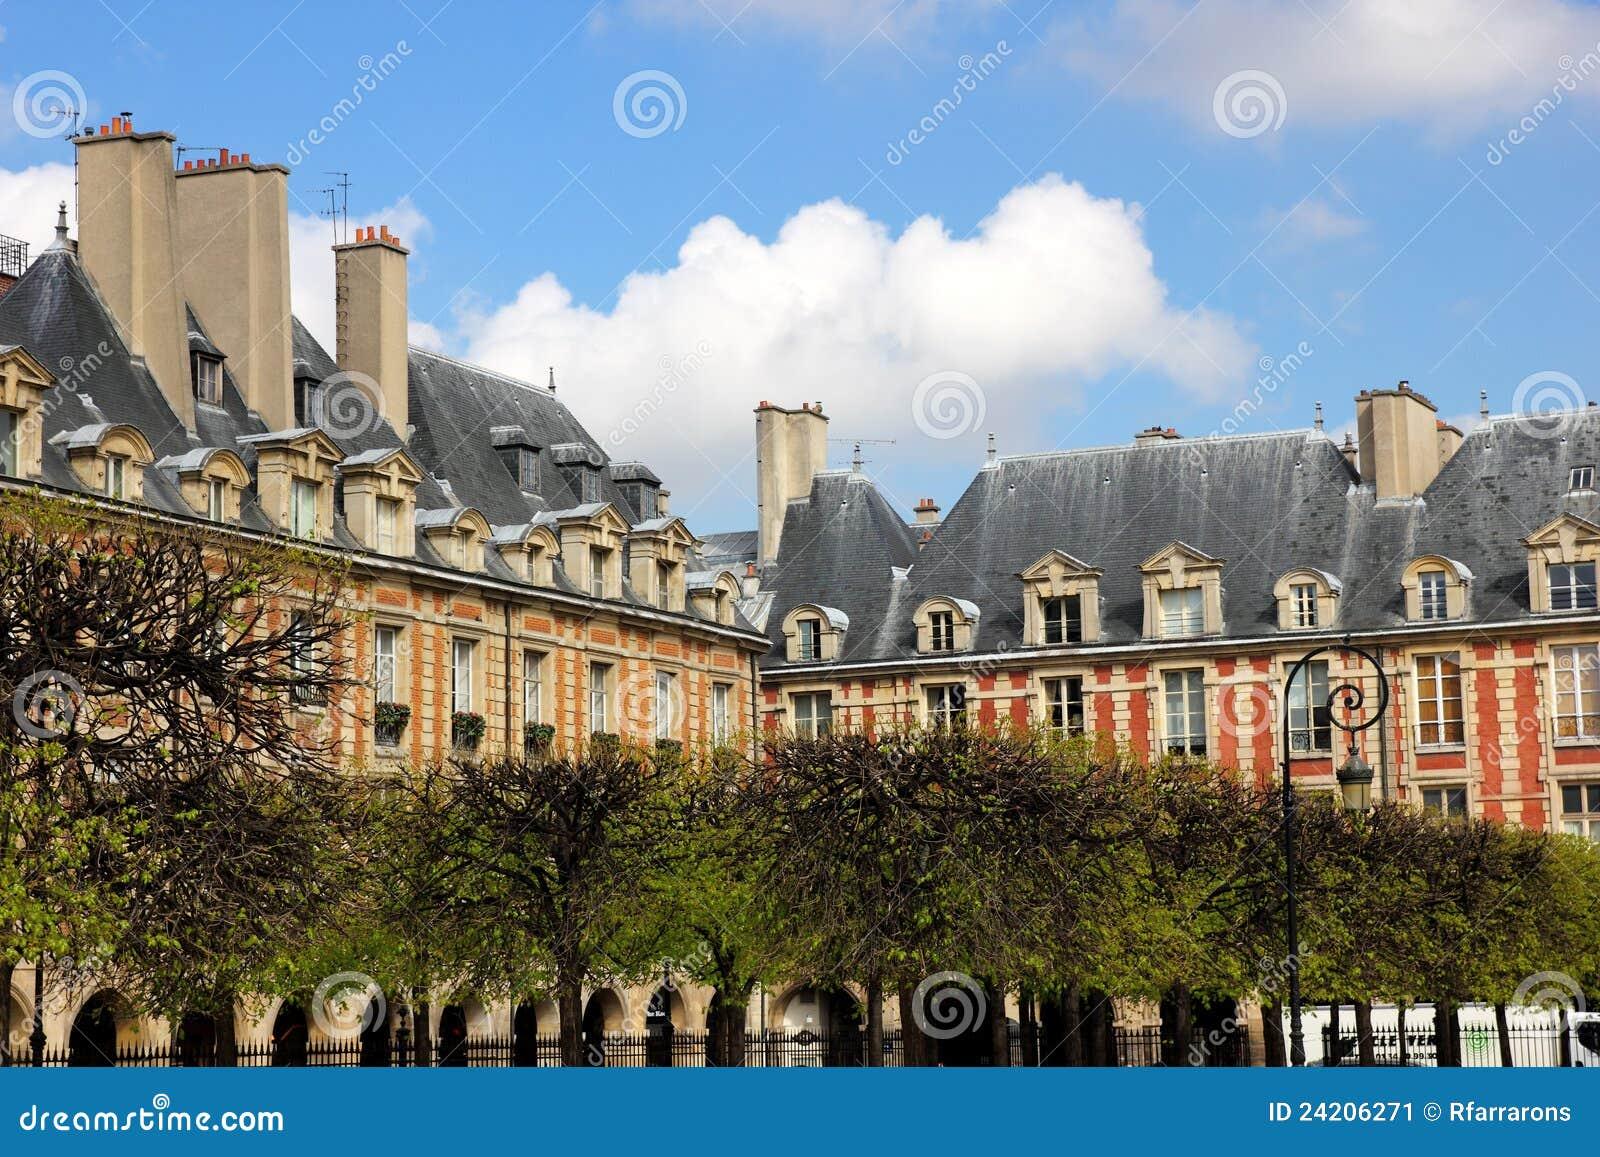 Franse architectuur huizen in parijs stock afbeelding for Huizen architectuur